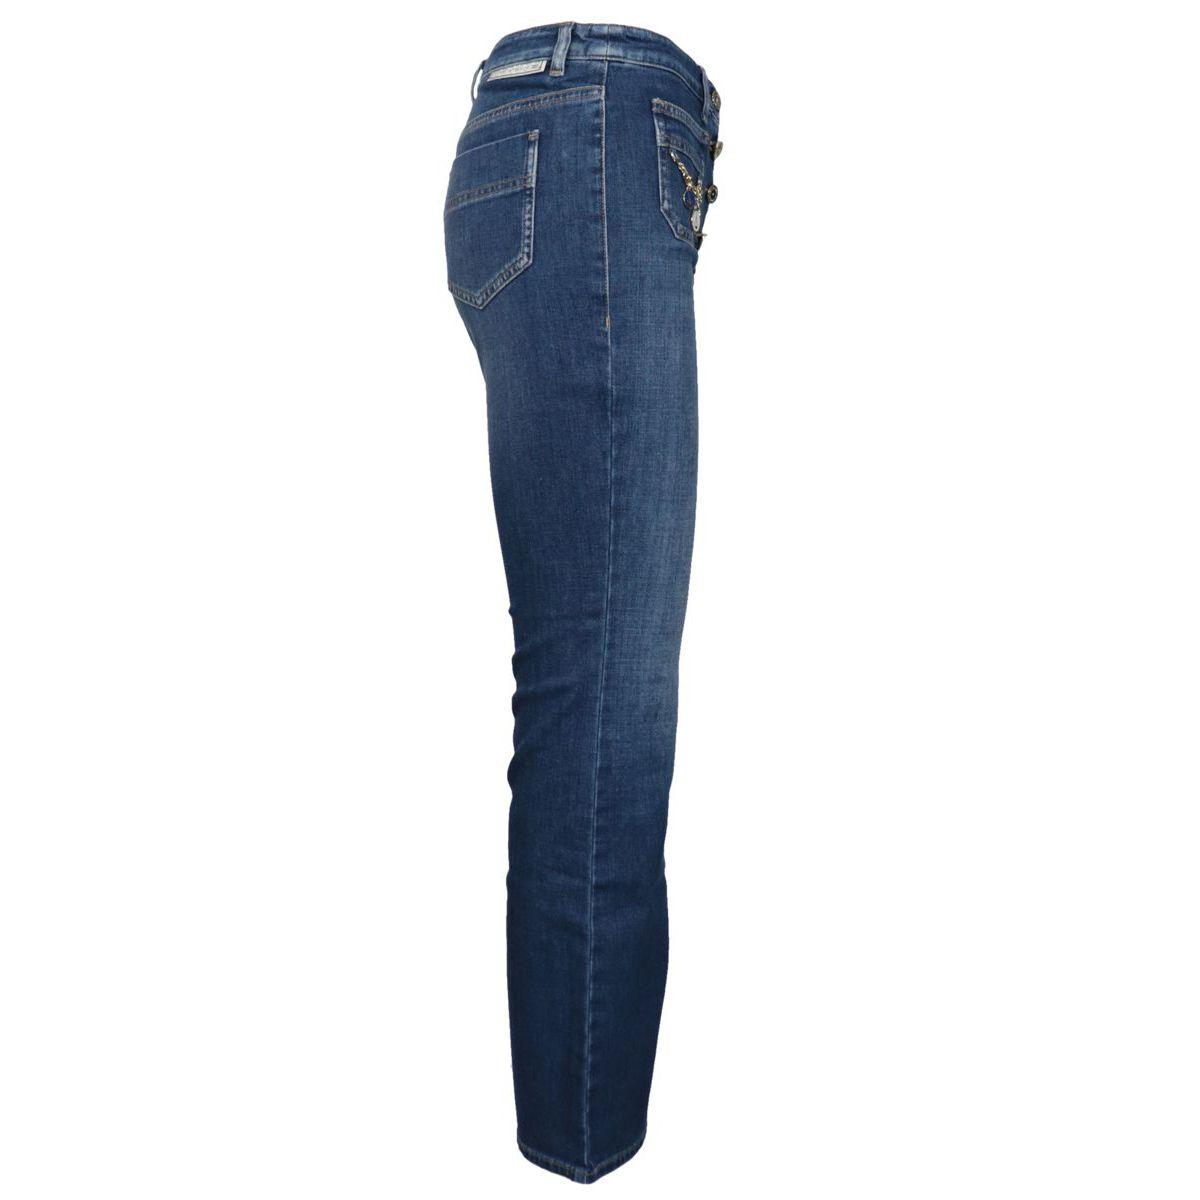 Skinny calf-cut jeans Blue / denim Elisabetta Franchi